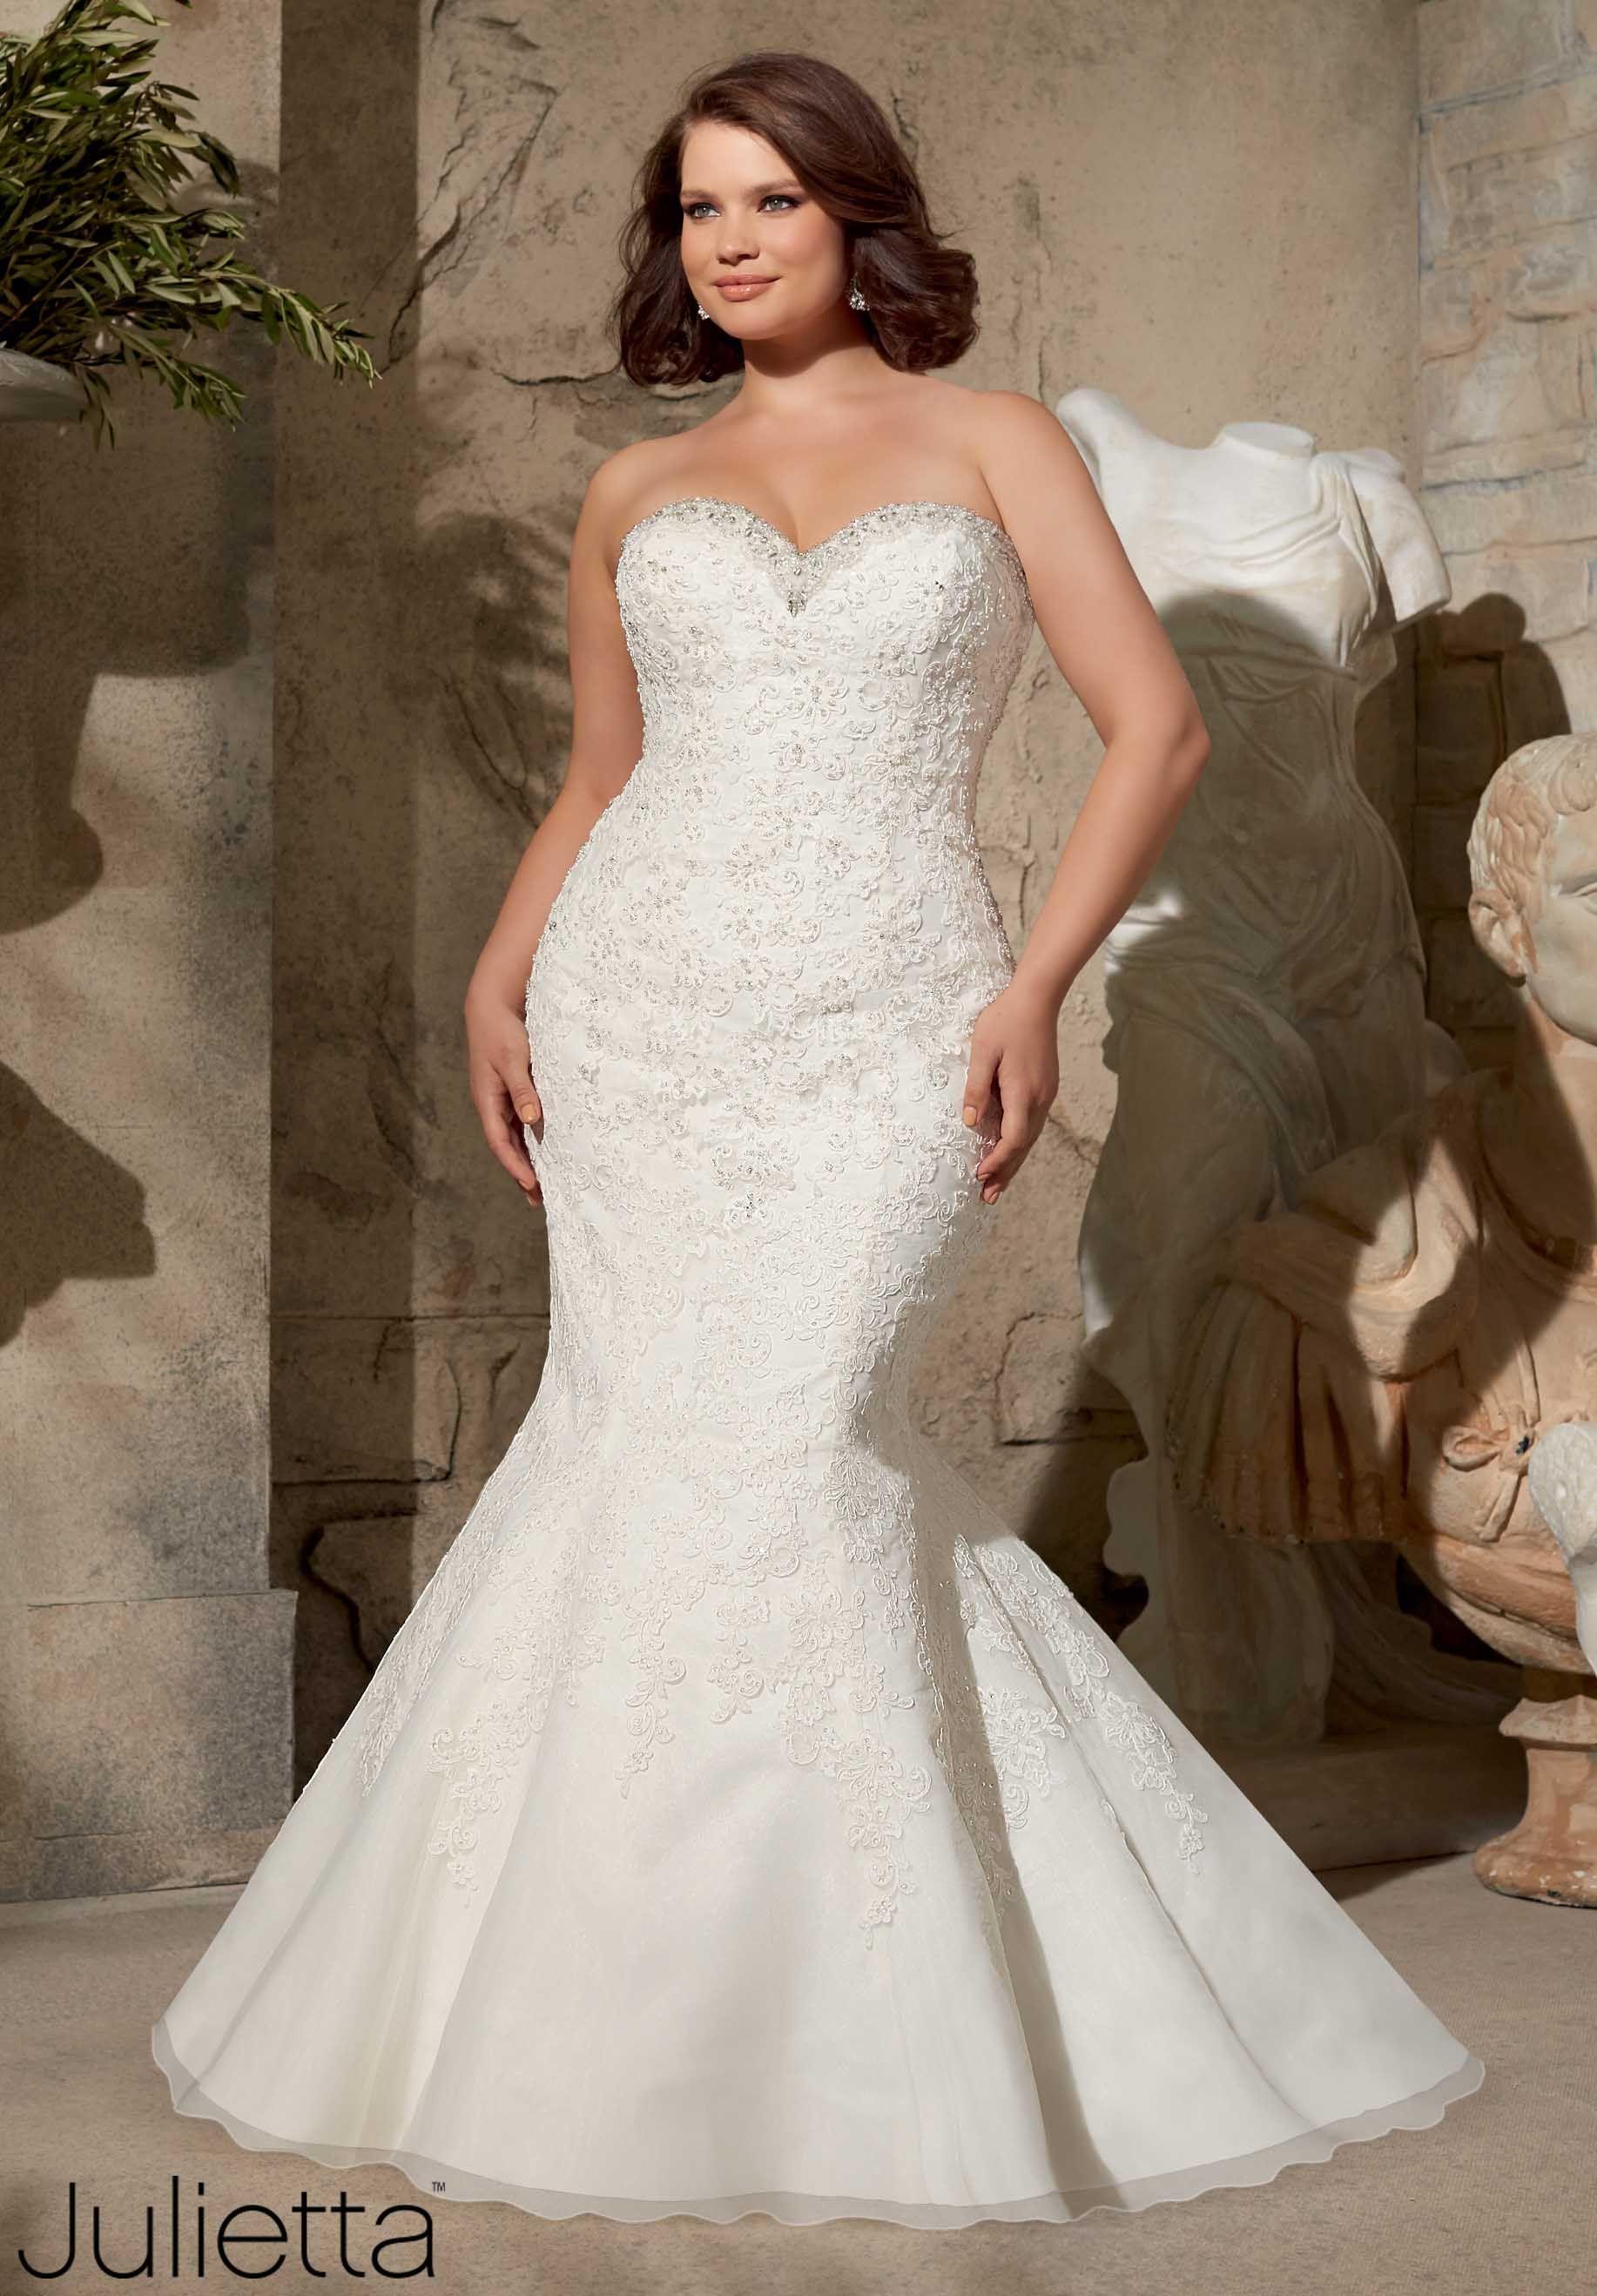 Beautiful  best A Dash of Bleu us Favorite Wedding Dresses images on Pinterest Wedding dressses Wedding dress styles and Bridal gowns